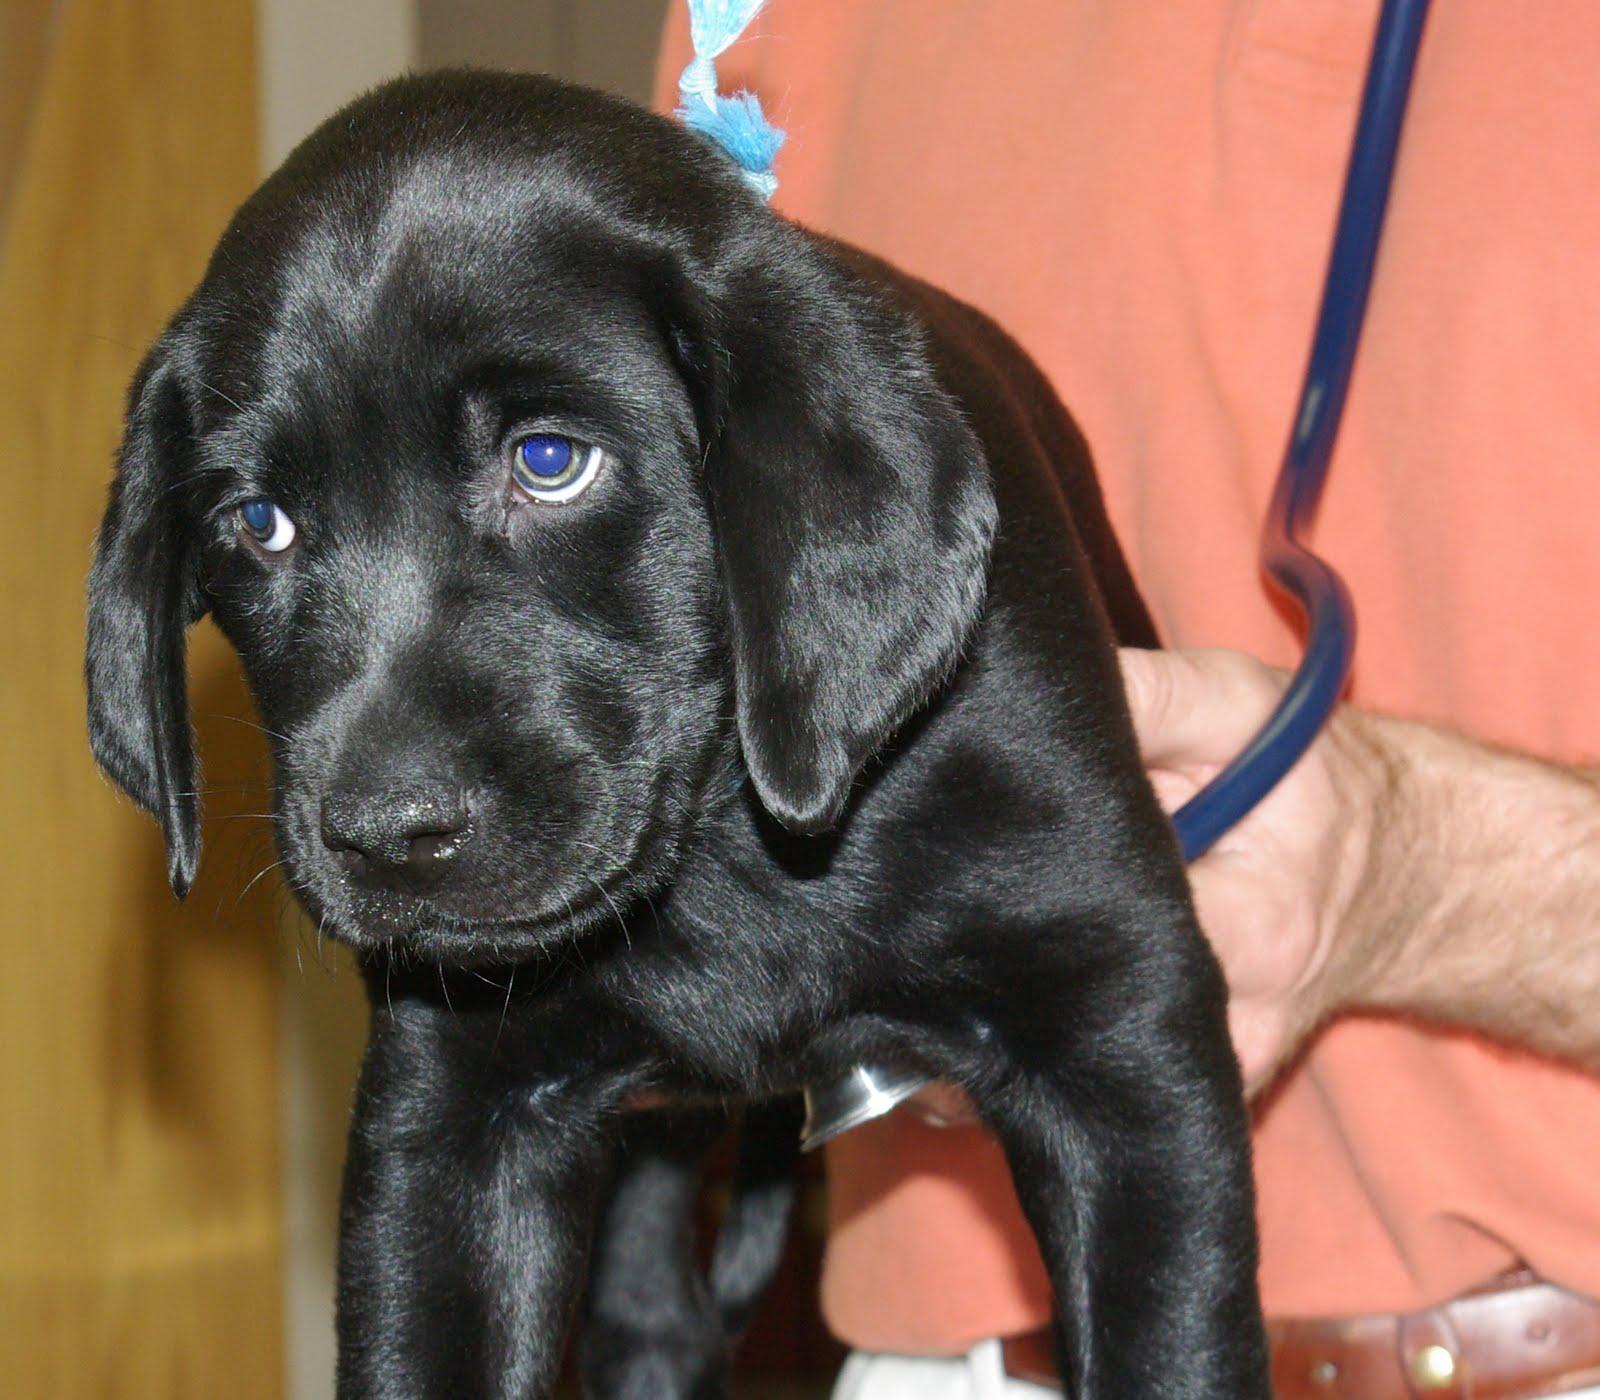 9 week old puppy recessed vulva